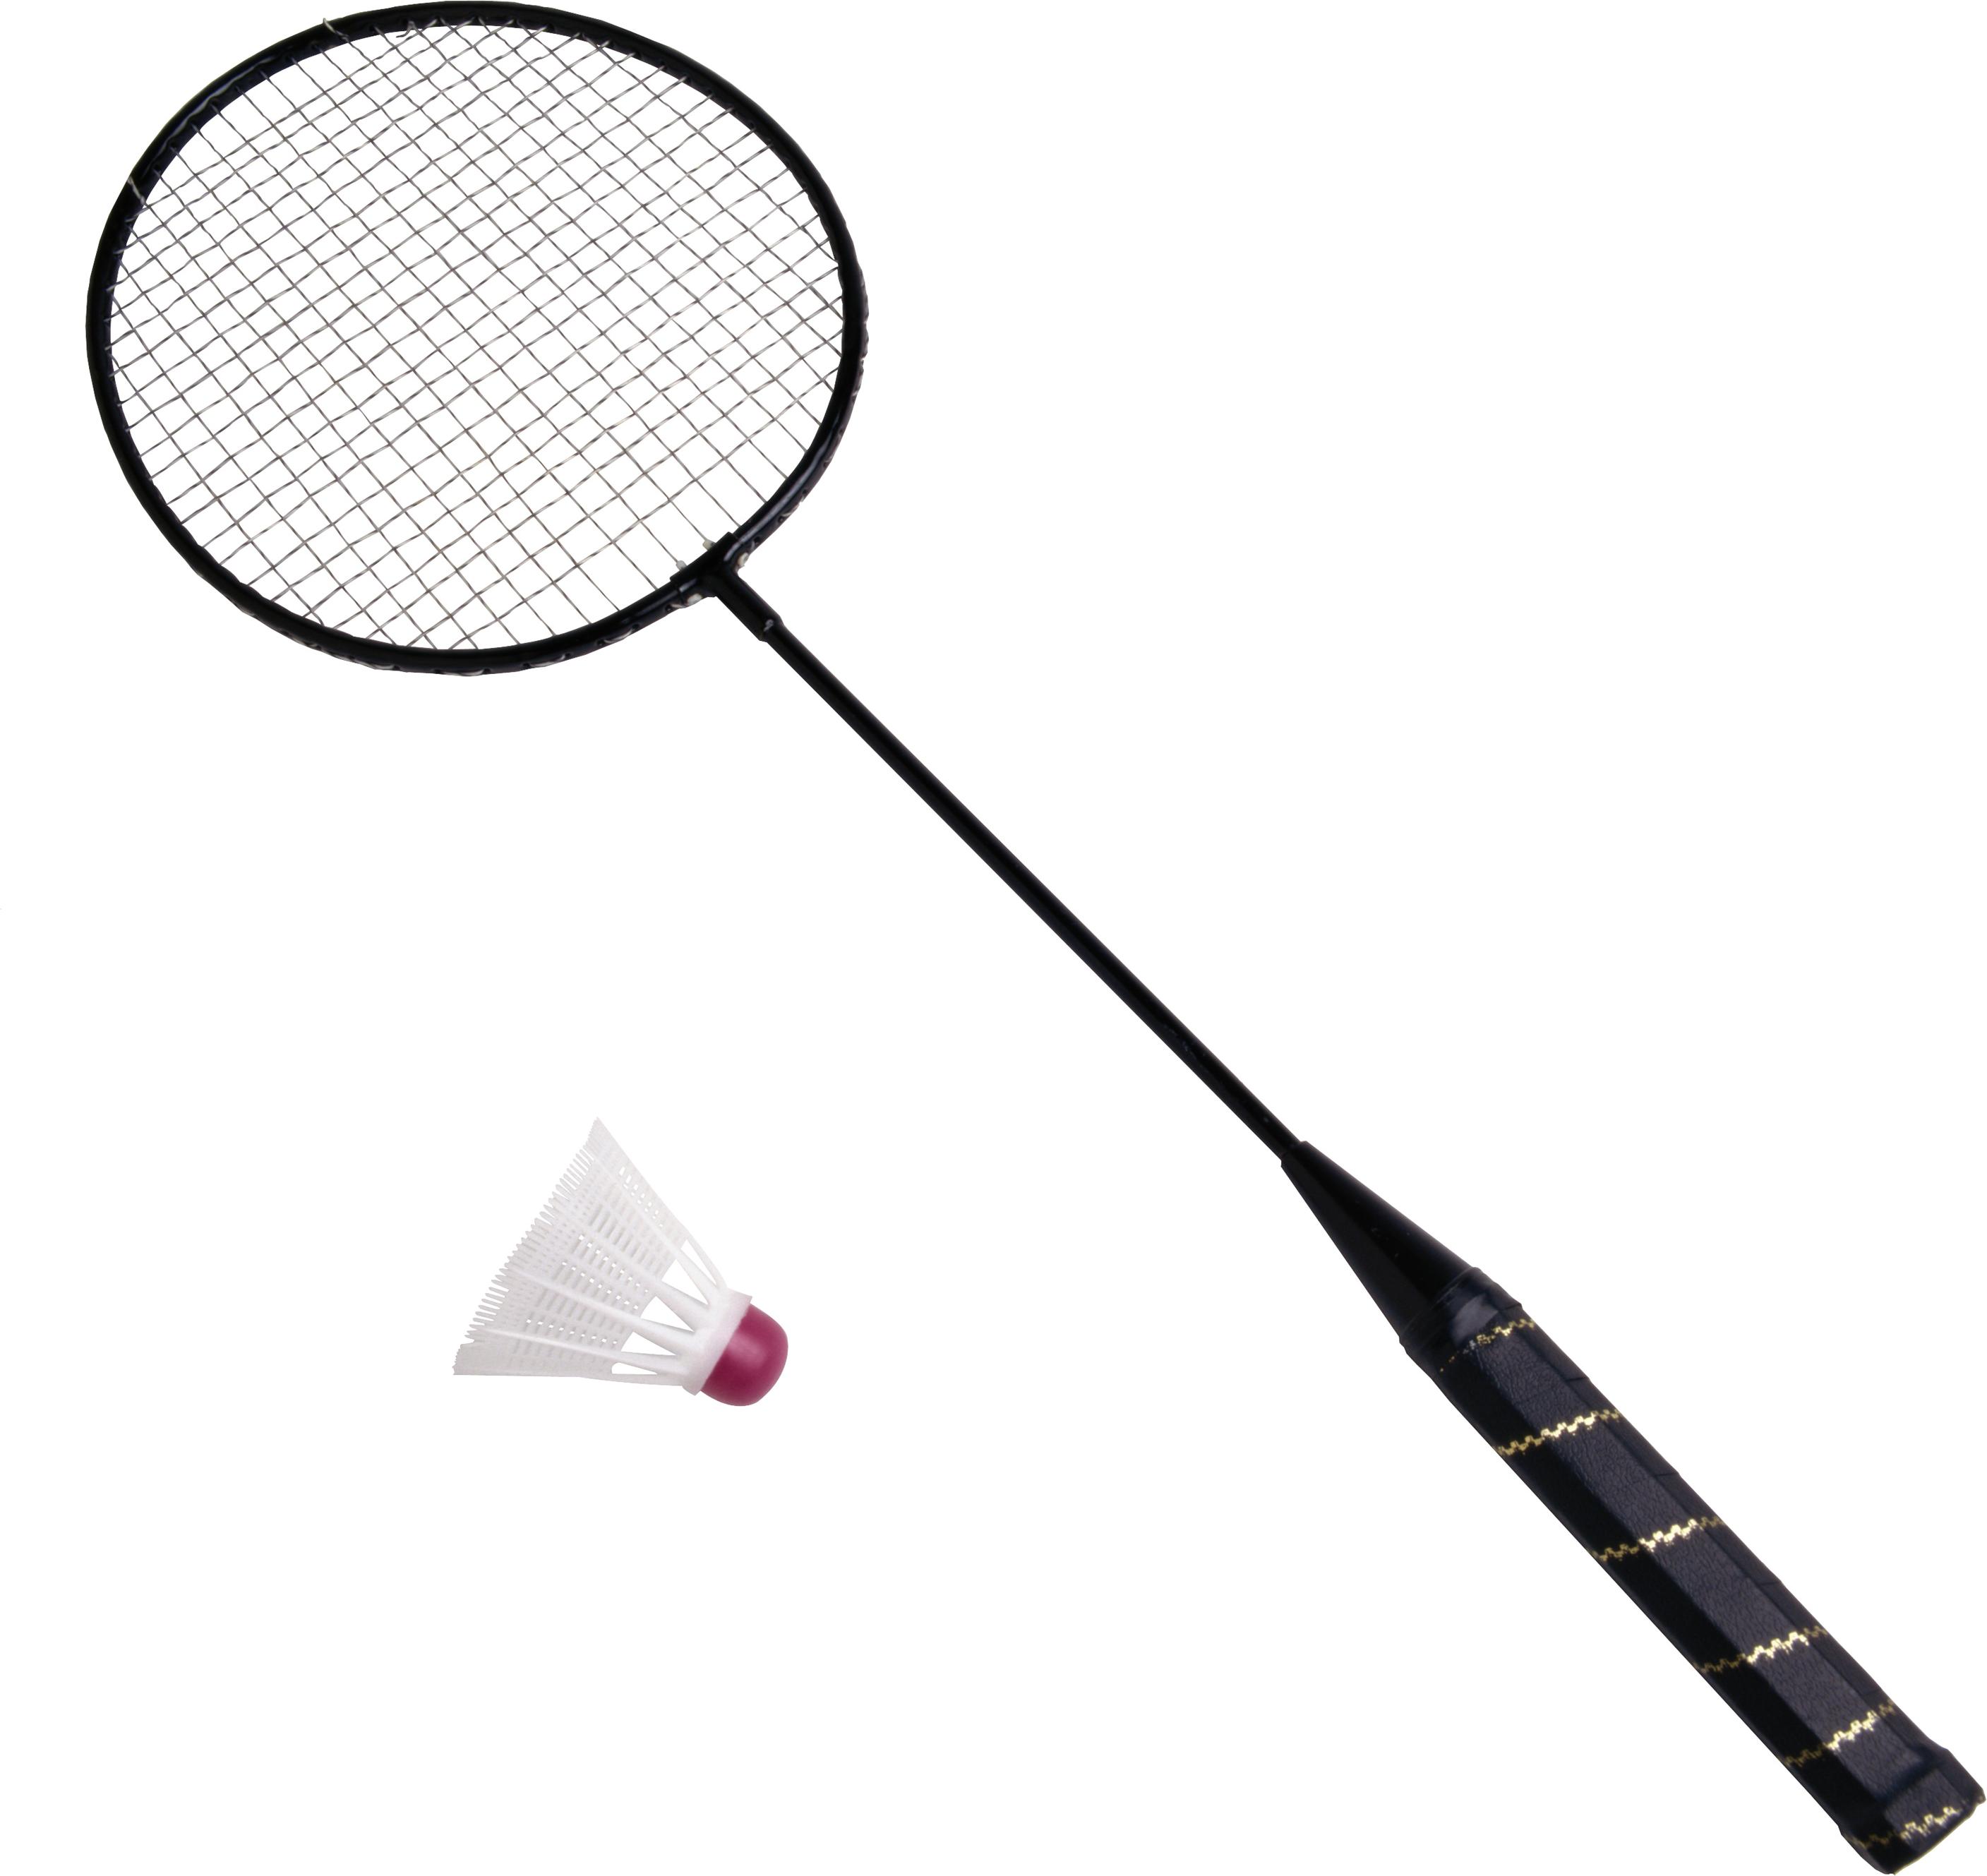 Badminton clipart badminton equipment. Racket png image